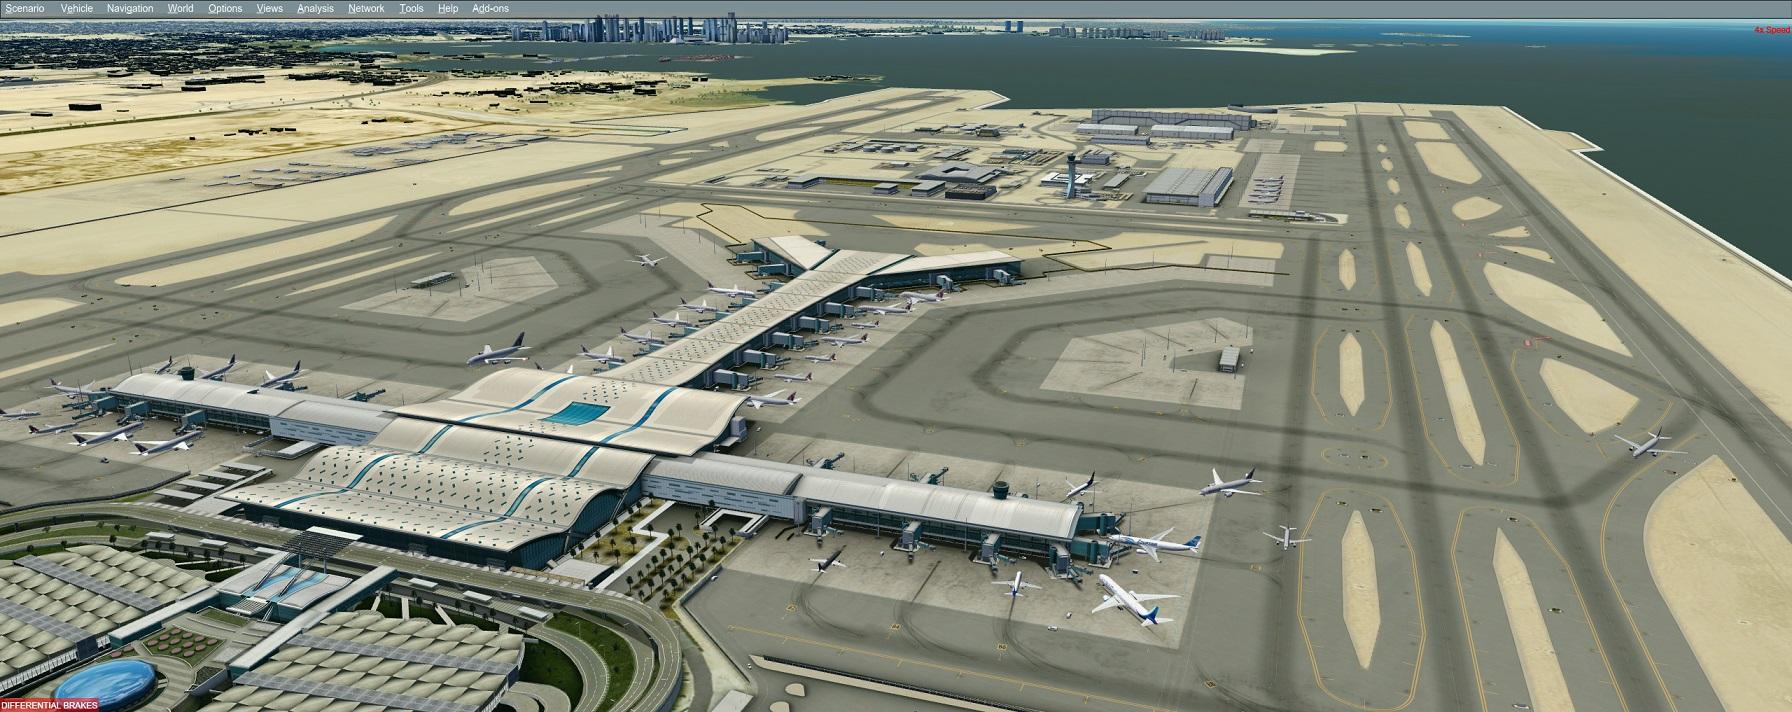 TAXI2GATE – OTHH Hamad International Airport (Doha)   JCAI